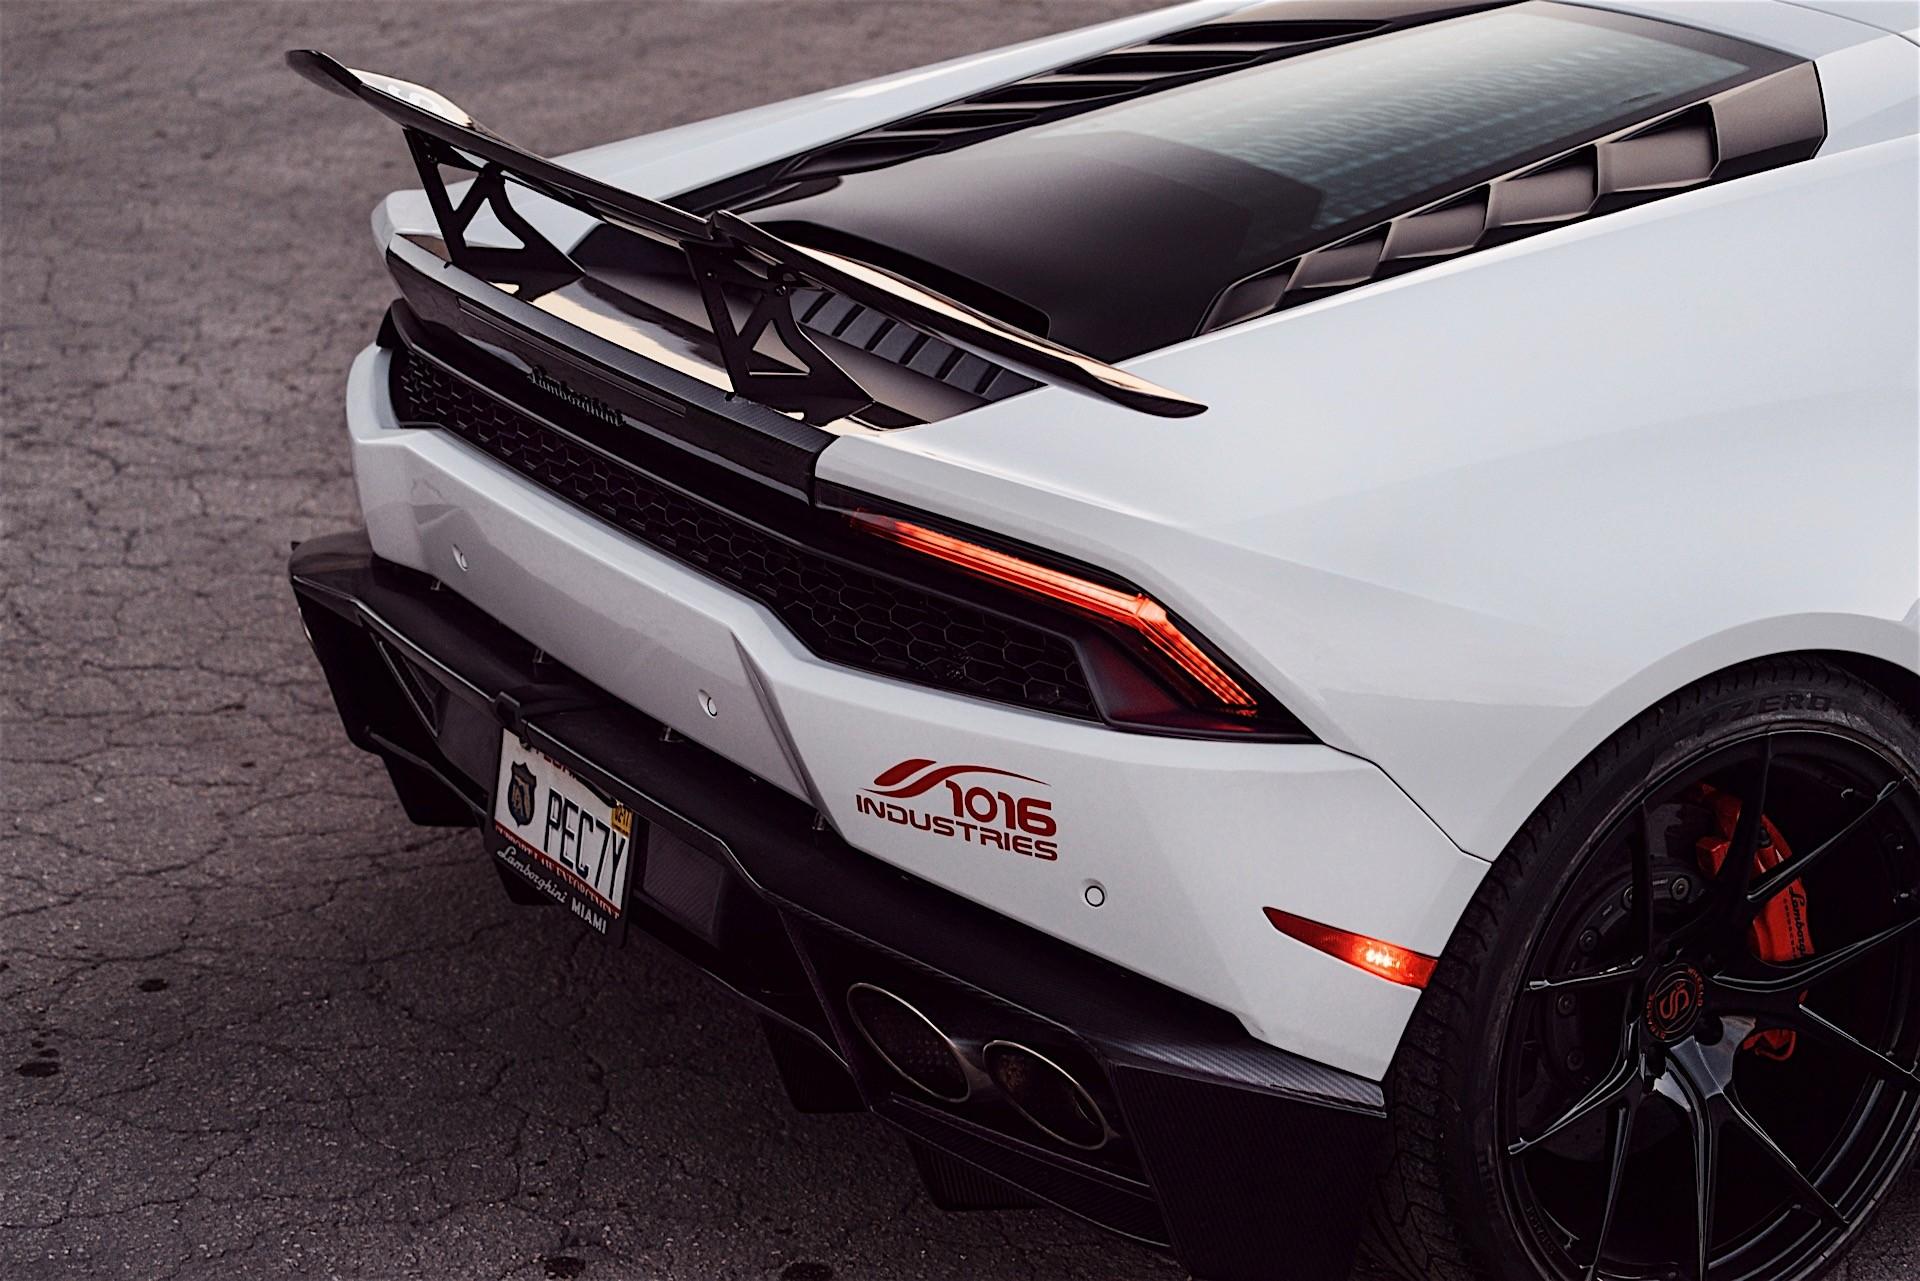 Lamborghini_Huracan_1016_Industries_14